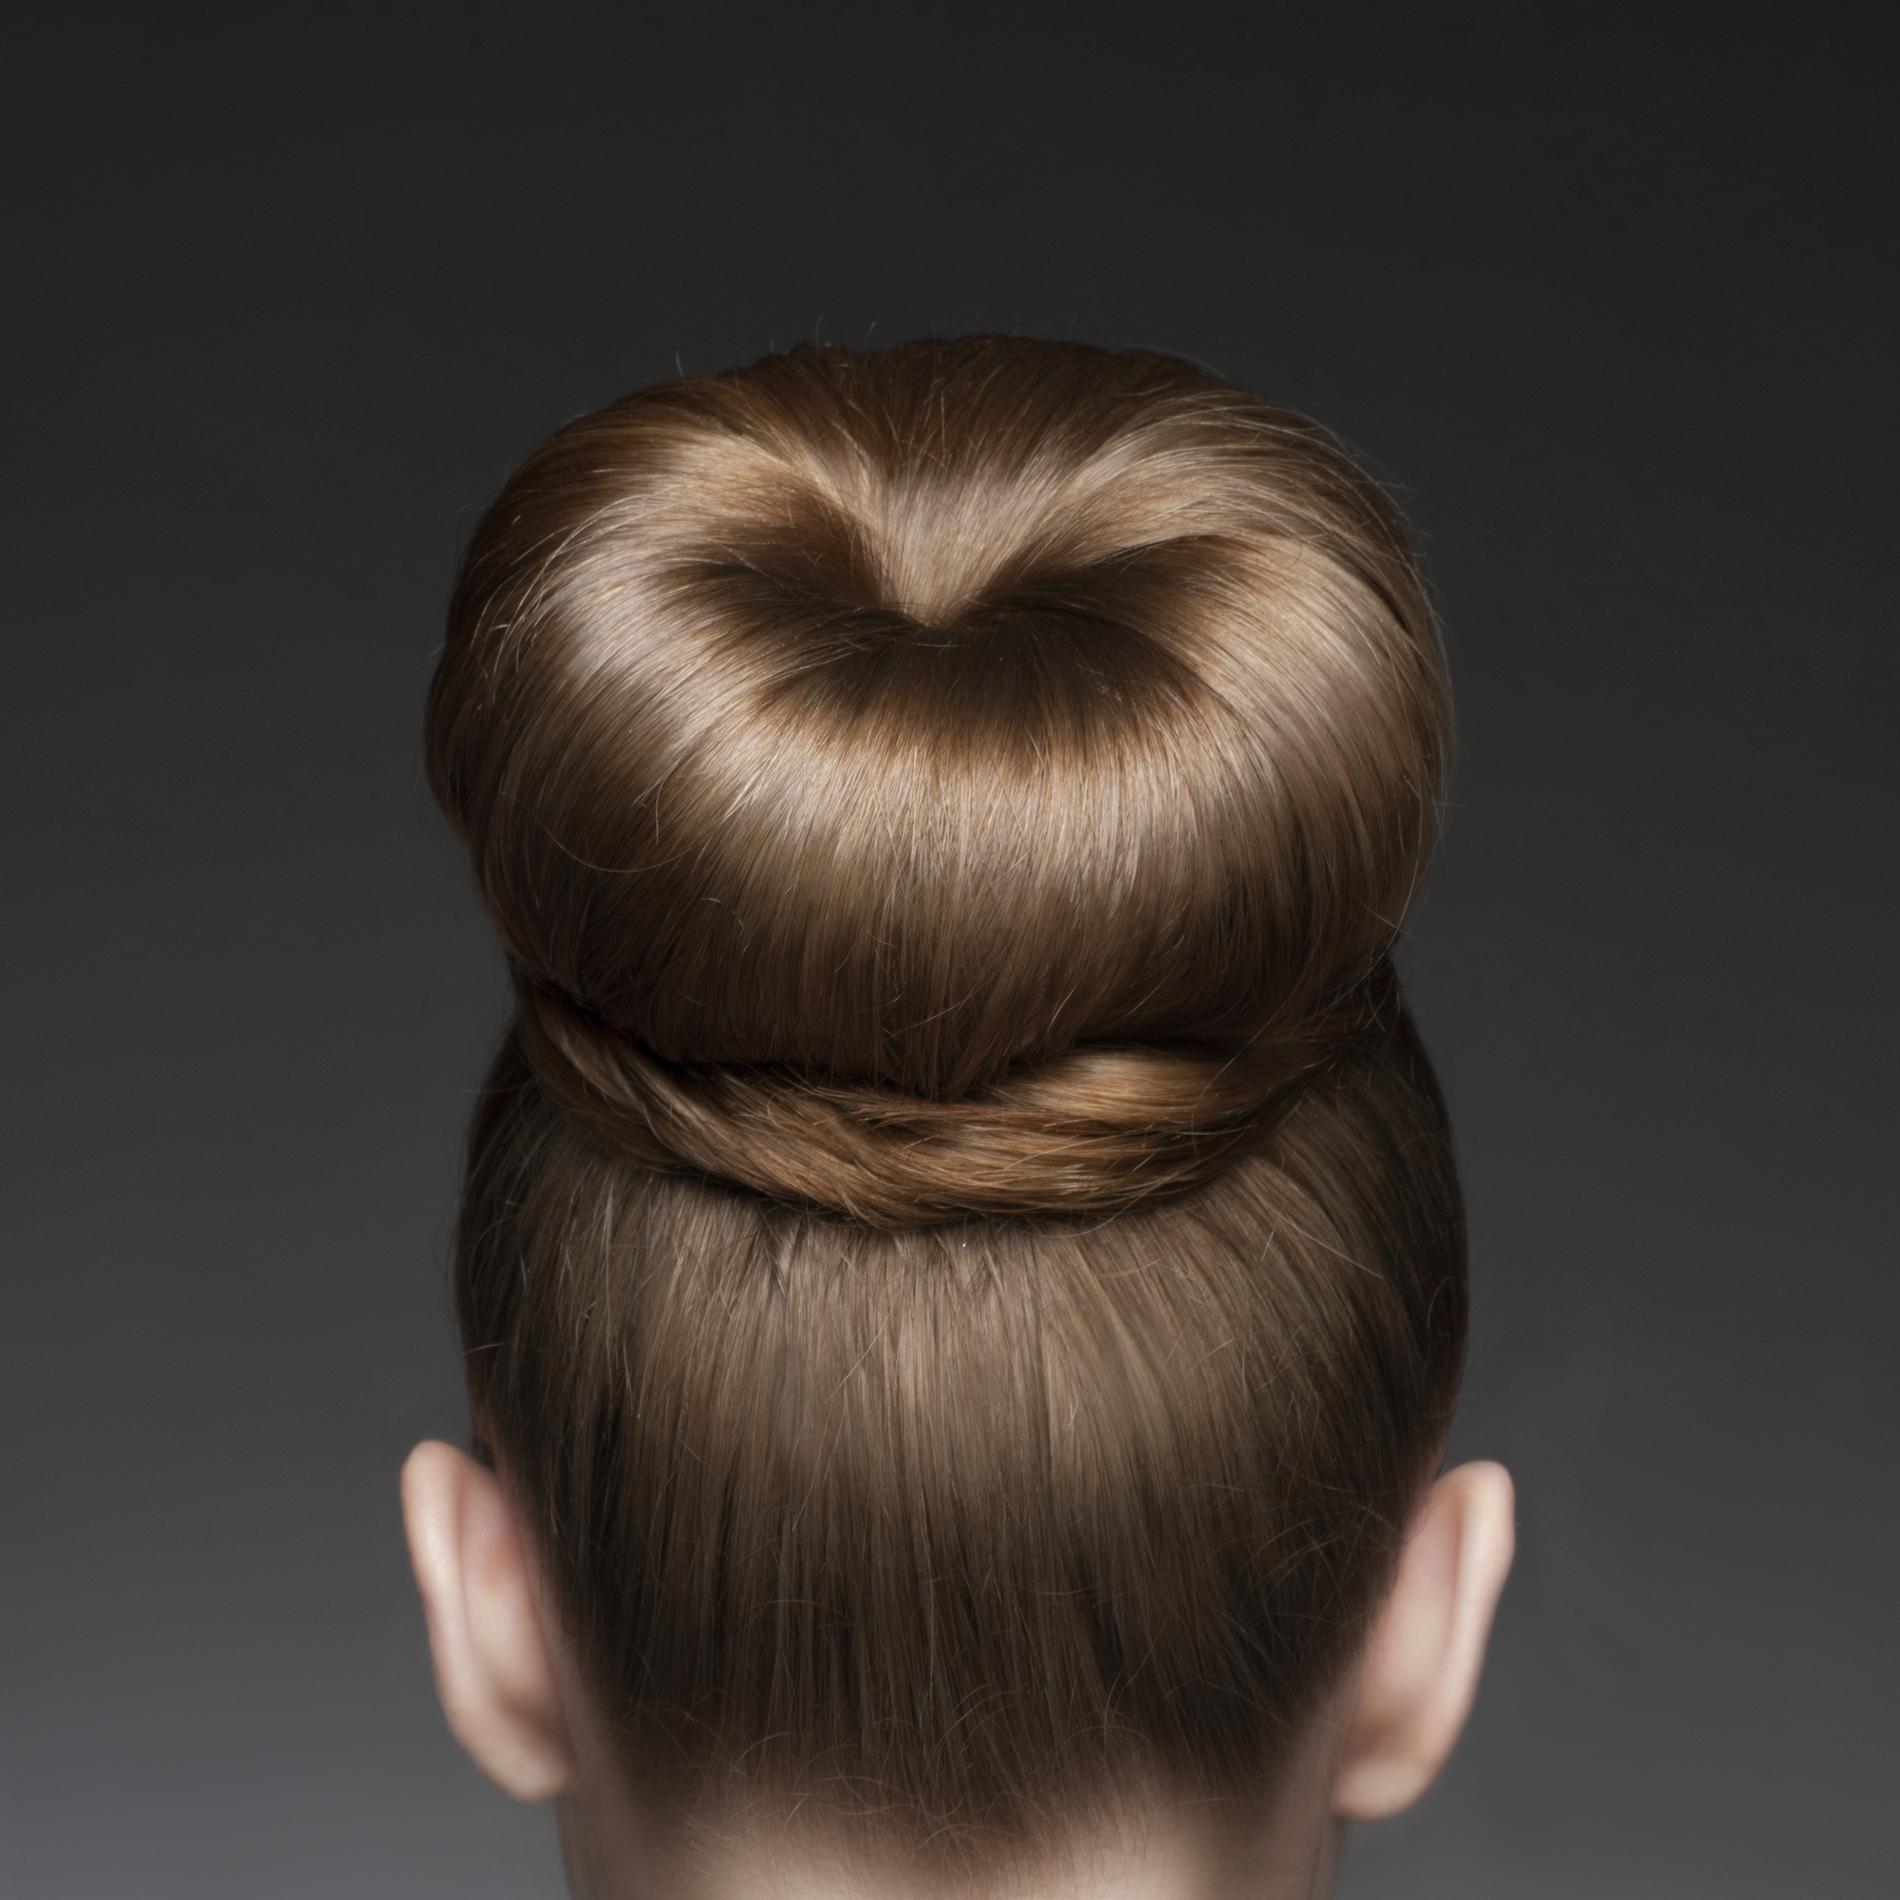 Trois Coiffures Creatives Pour Des Cheveux Mi Longs Madame Figaro